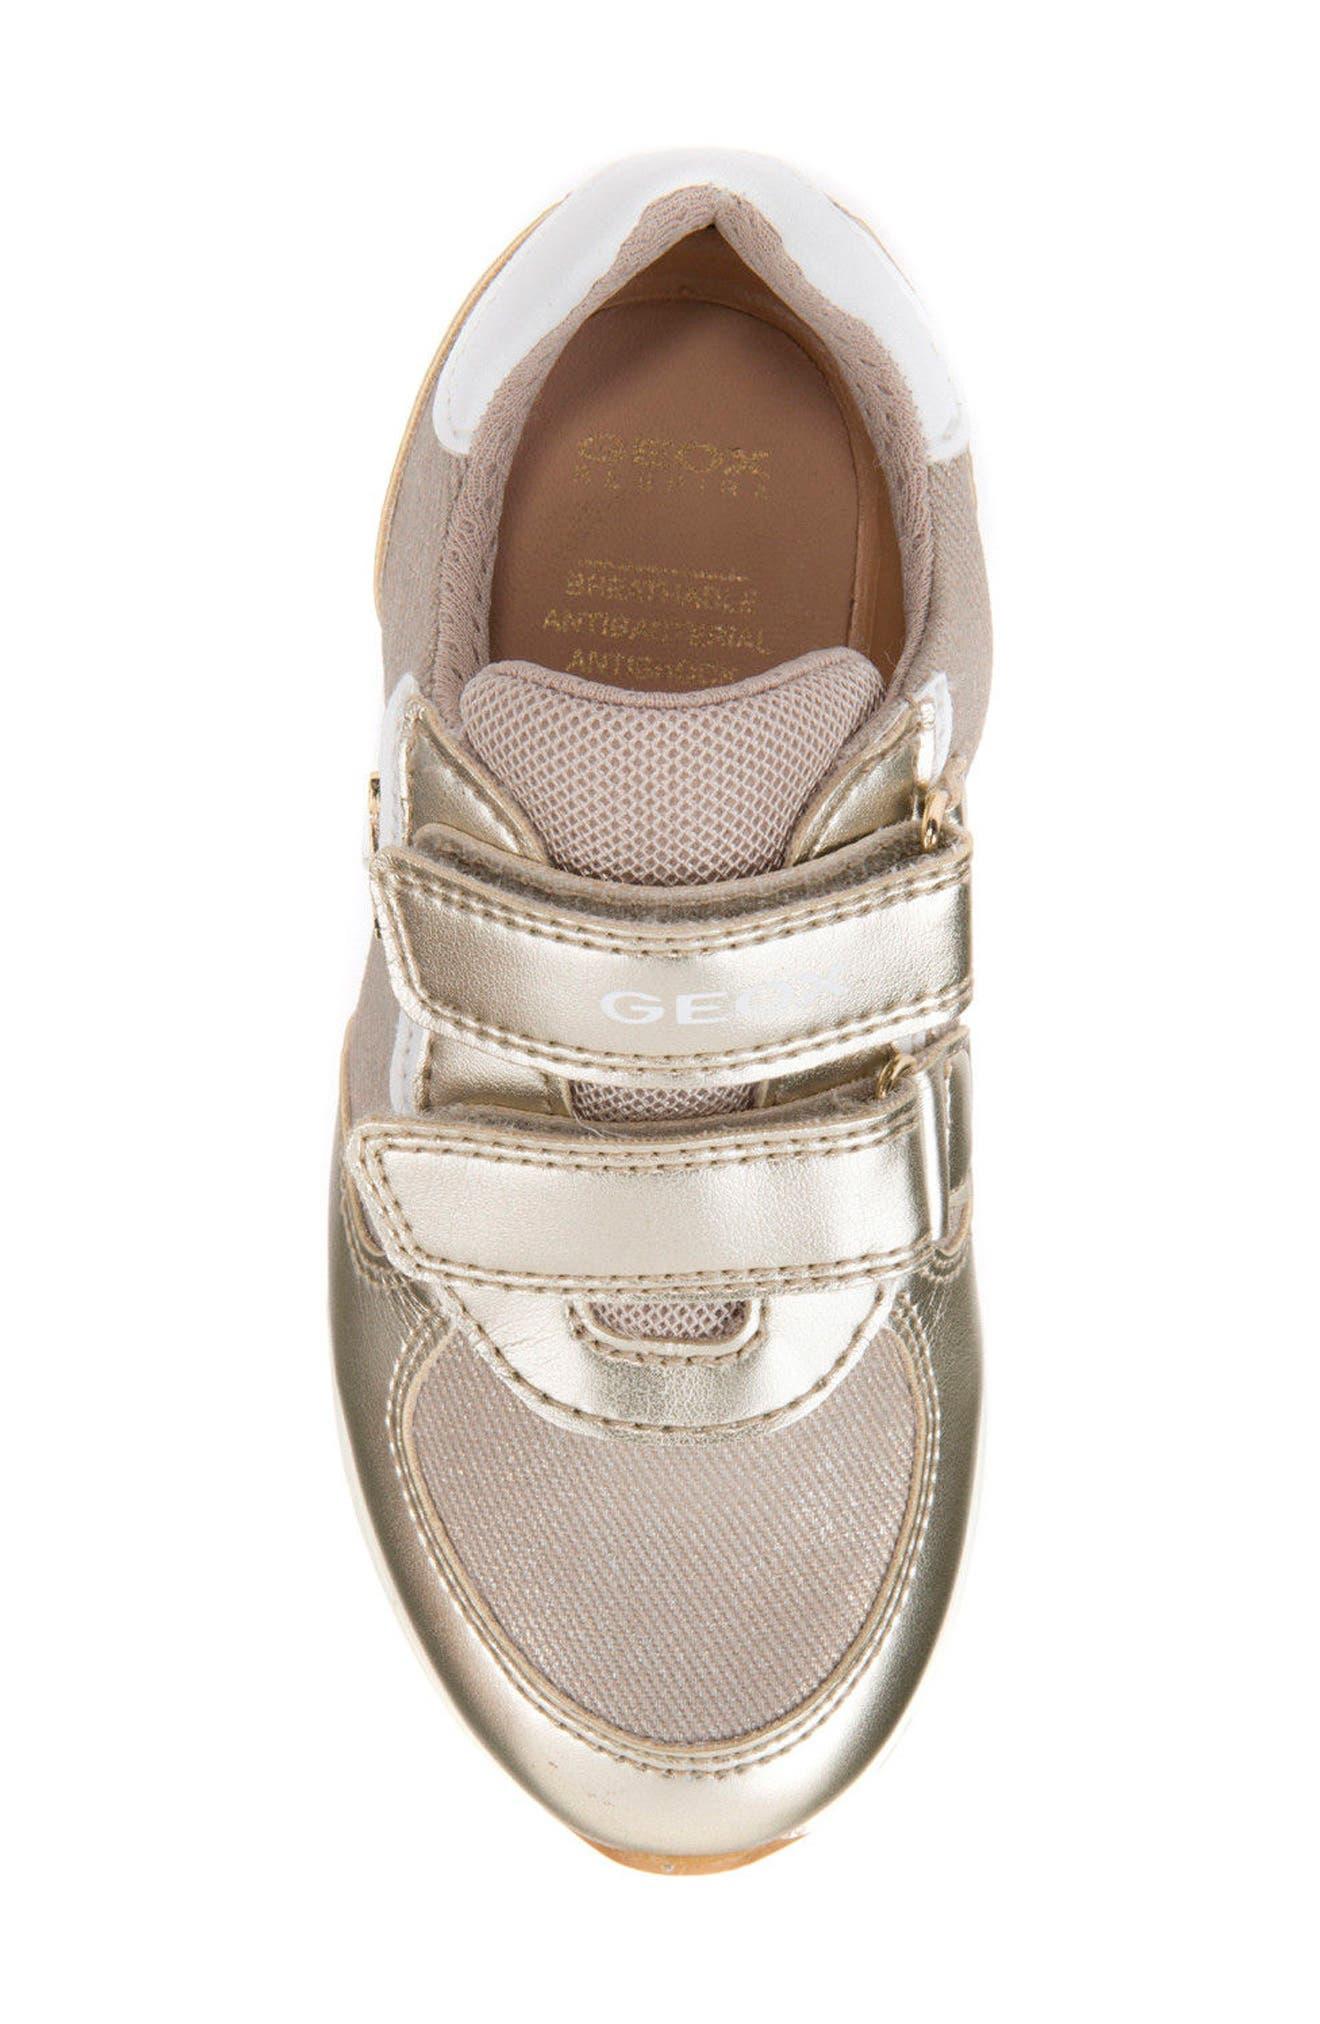 Jensea Metallic Accent Sneaker,                             Alternate thumbnail 4, color,                             BEIGE/ LIGHT GOLD